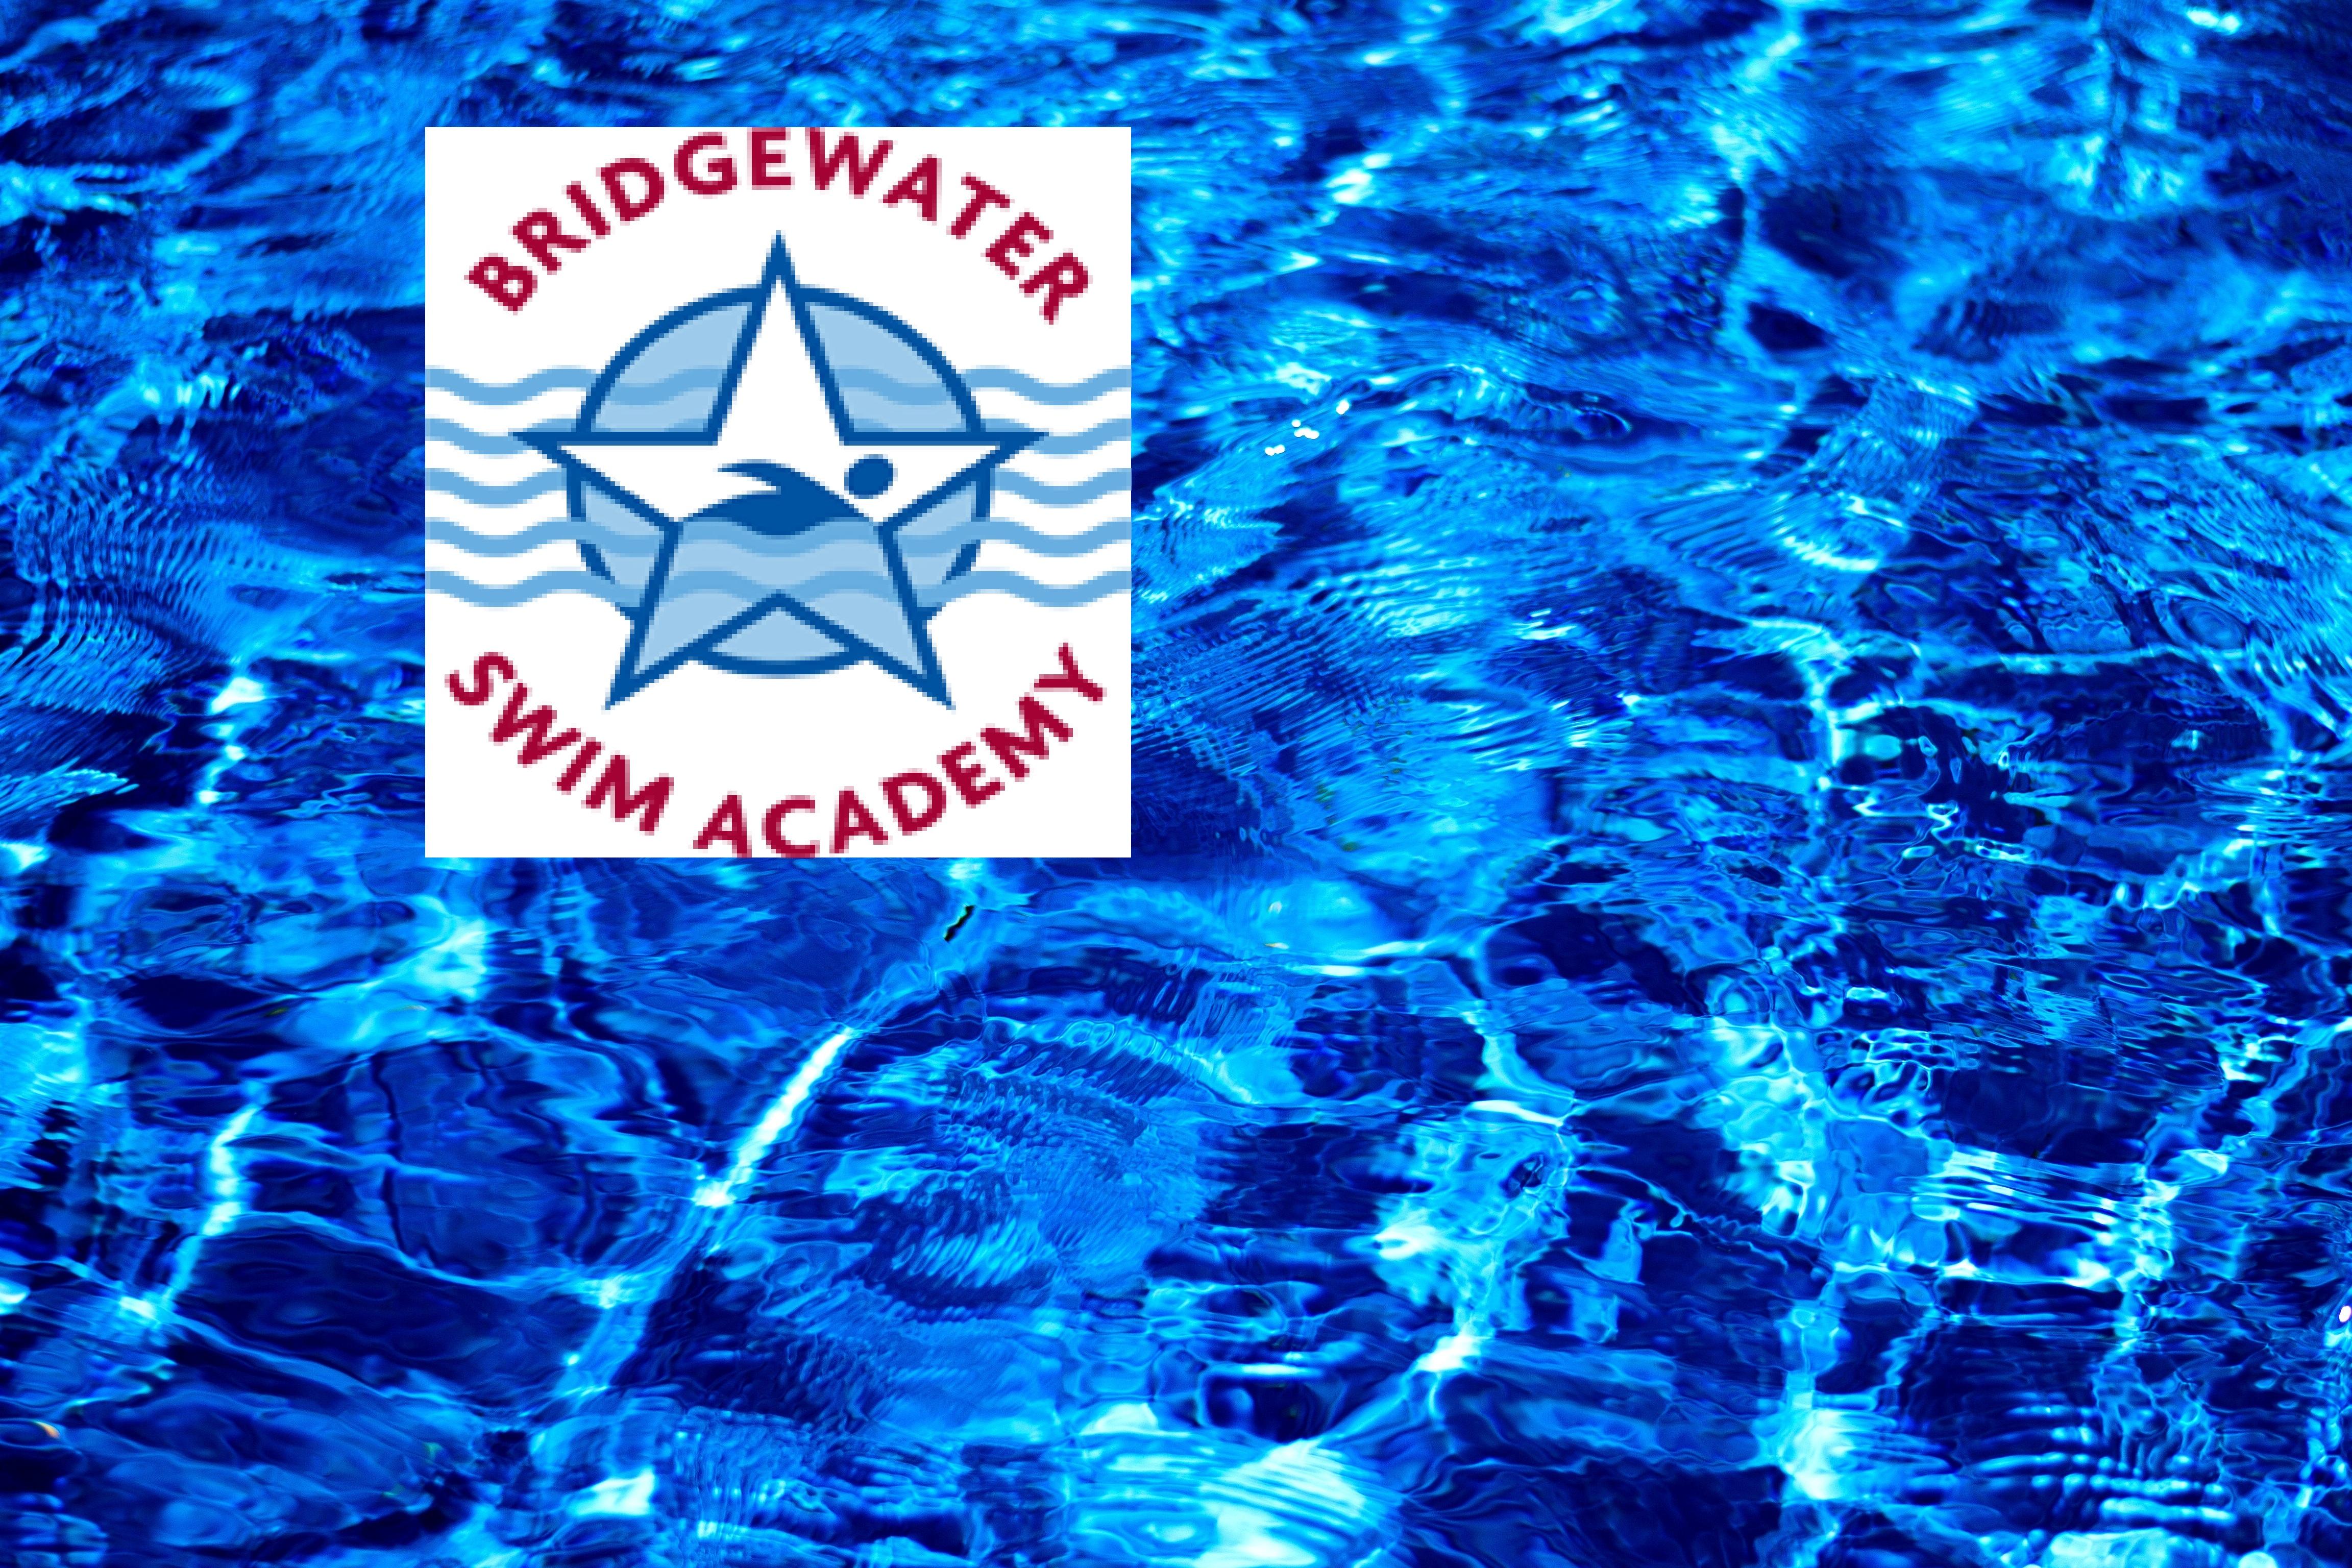 Bridgewater Open House